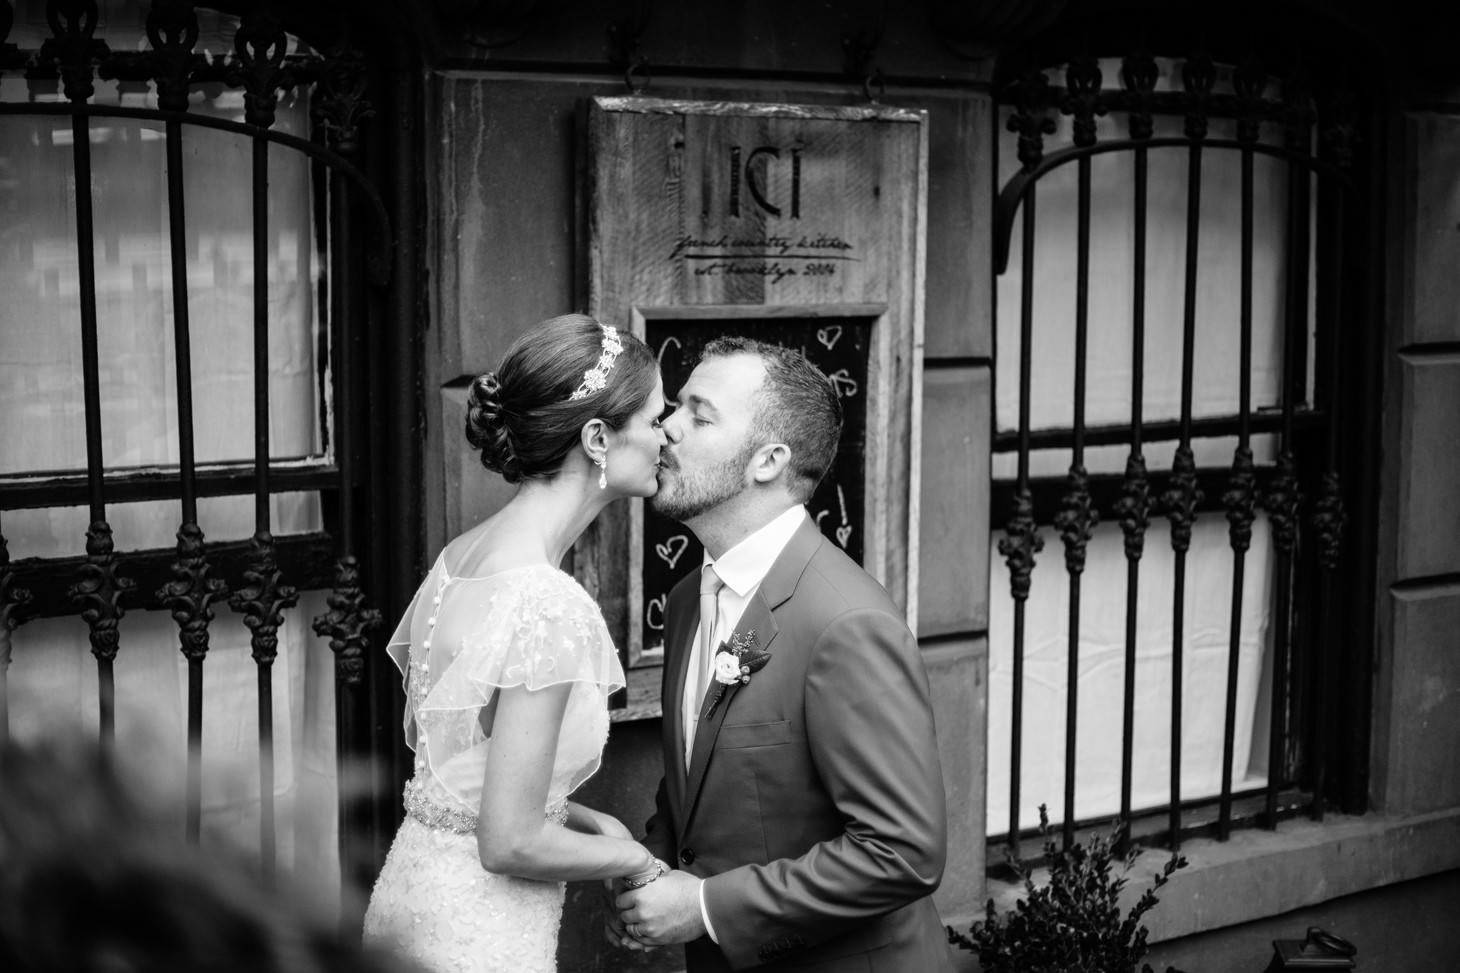 brooklyn-restaurant-wedding-nyc-weddingi-photographer-smitten-chickens21.jpg